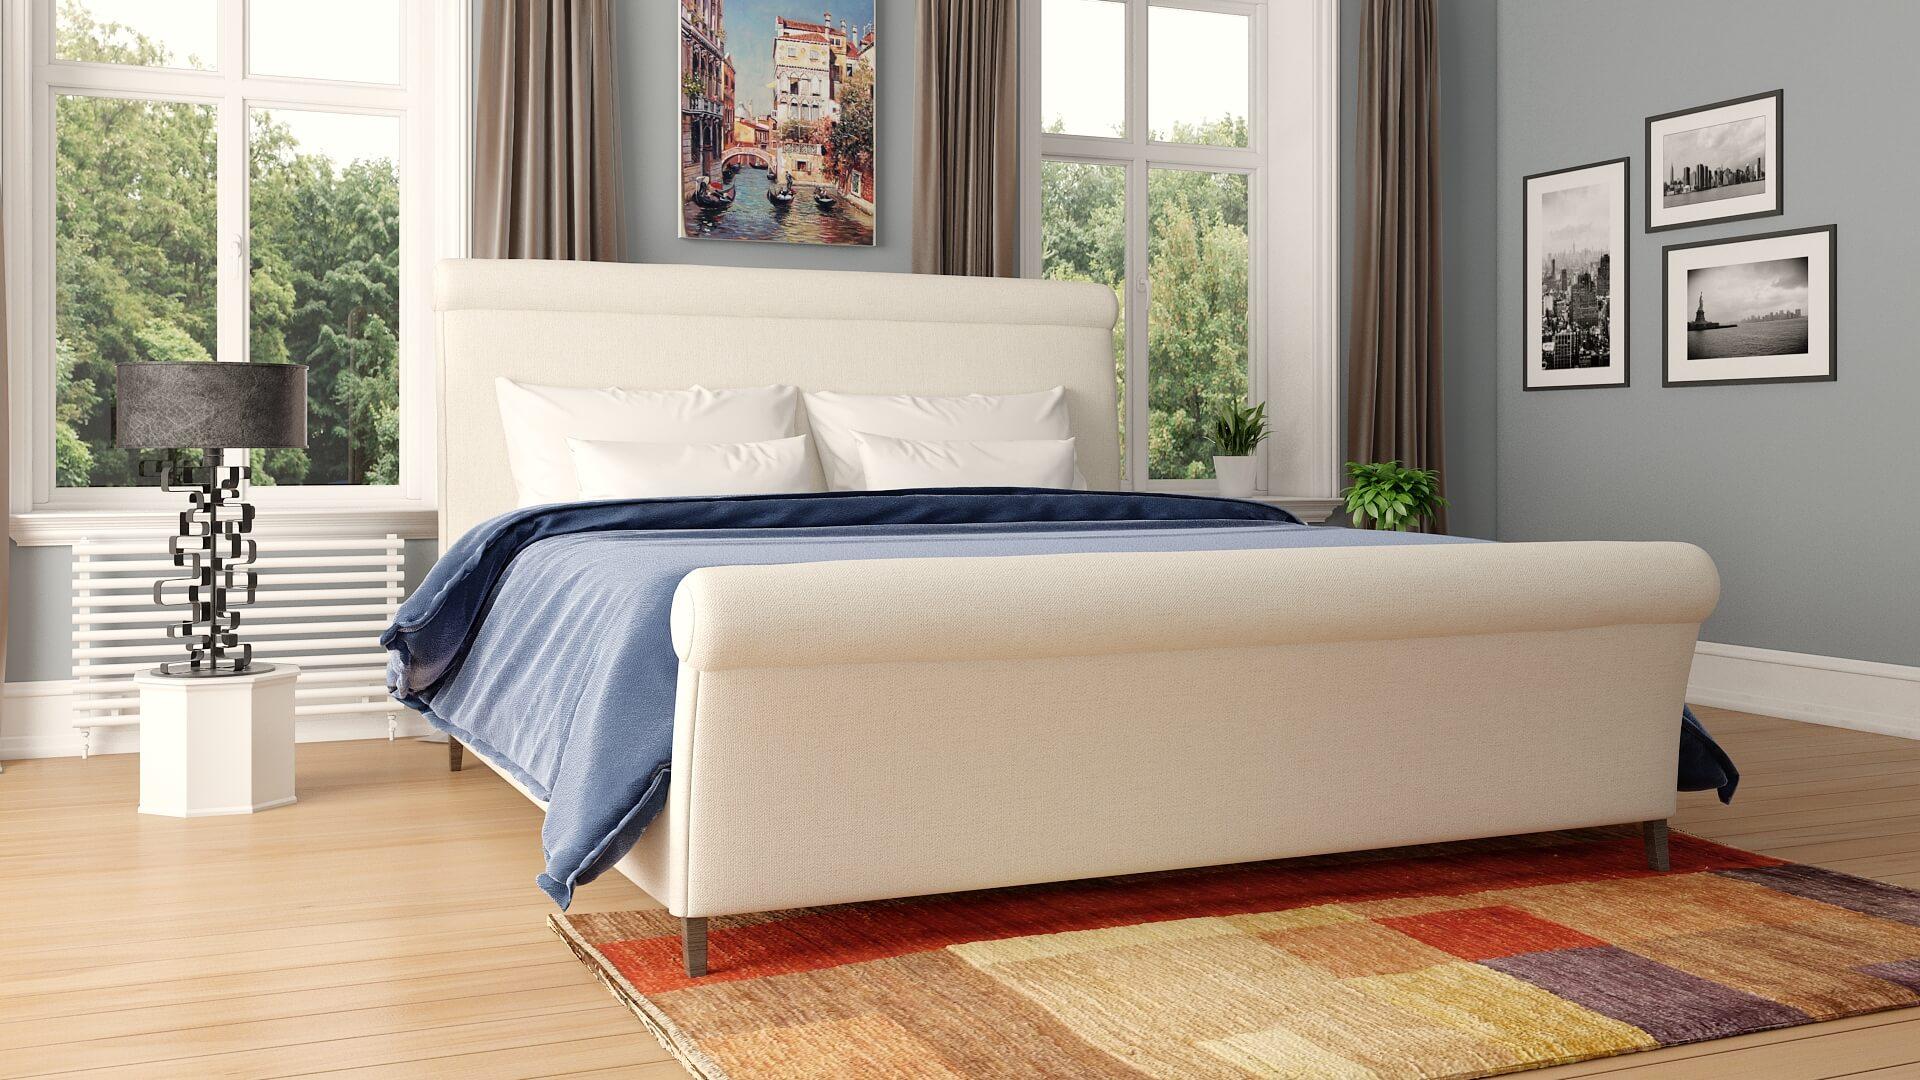 maja bed furniture gallery 4